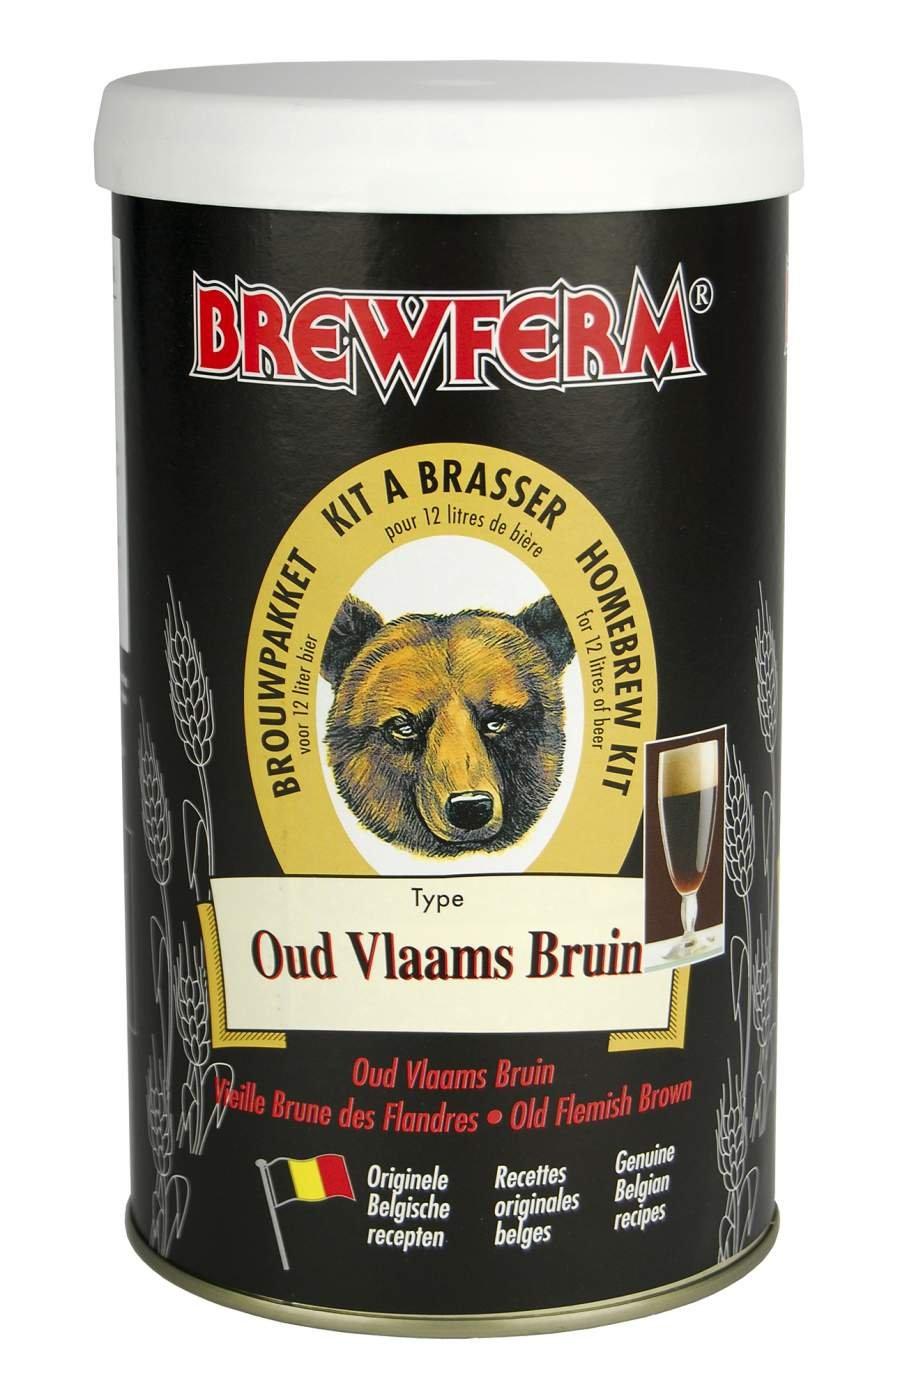 Kit Cerveza Oud Vlaams Bruin BREWFERM 056.065.5